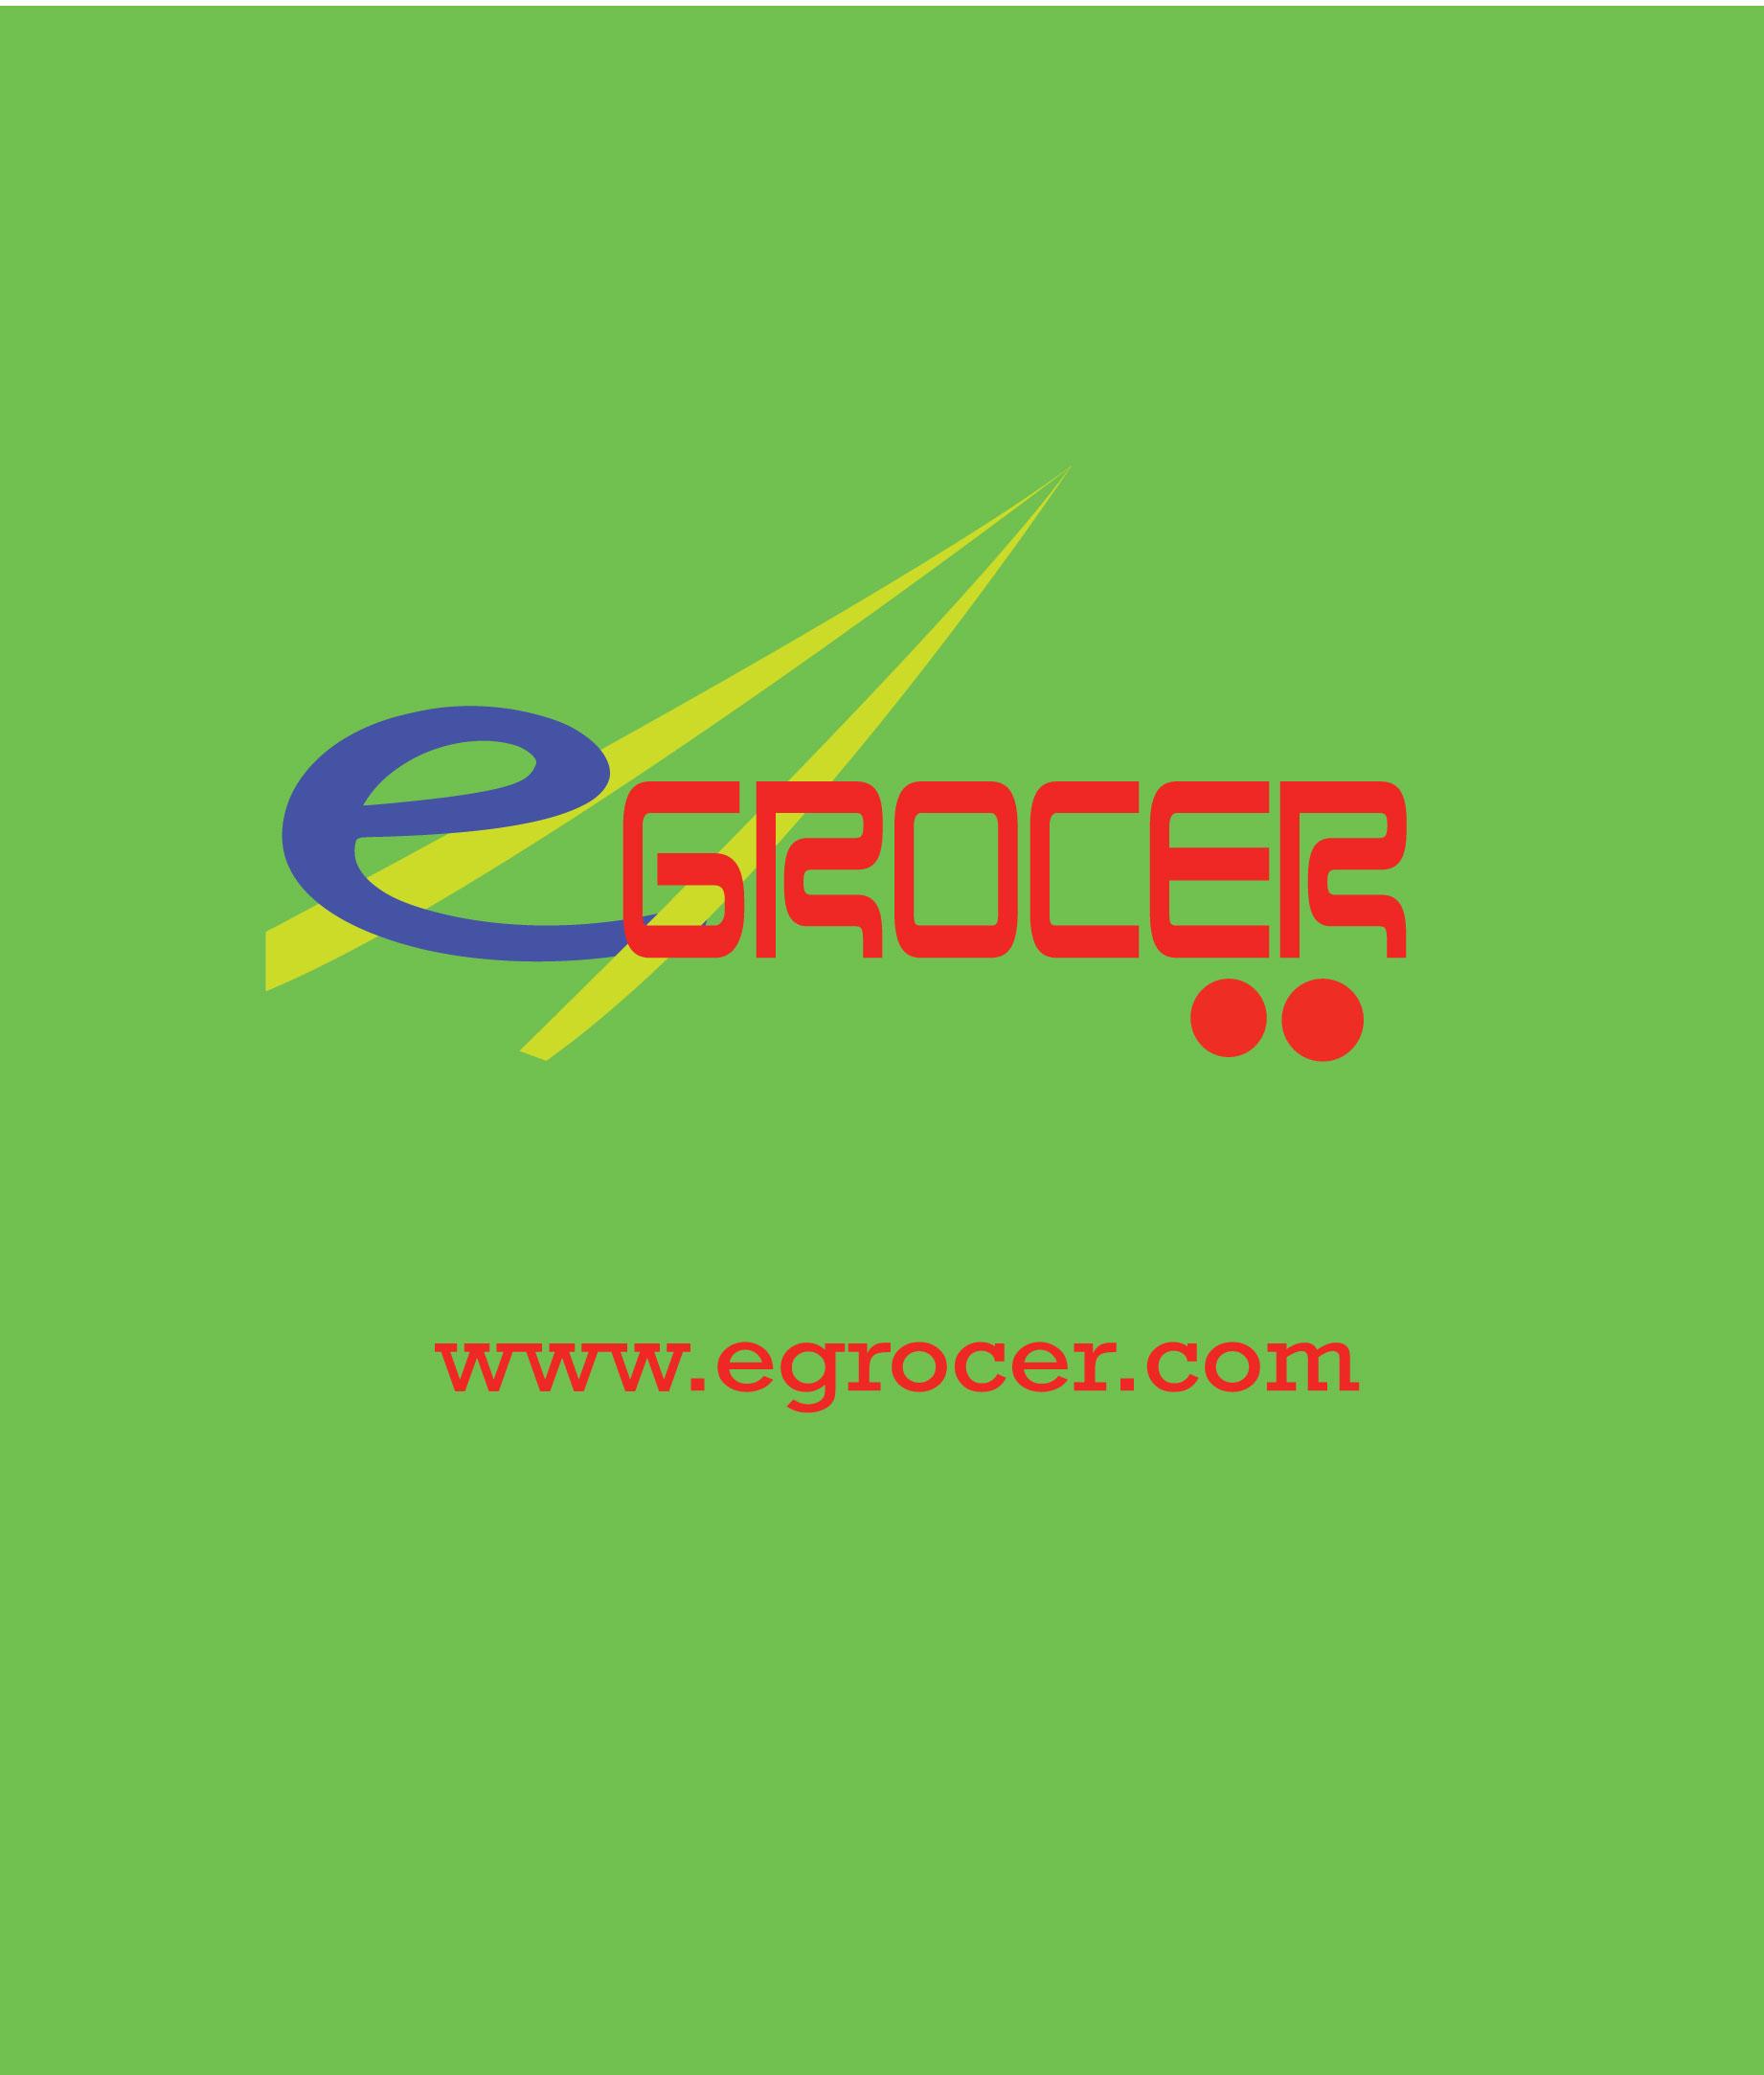 professional awesome logo design service